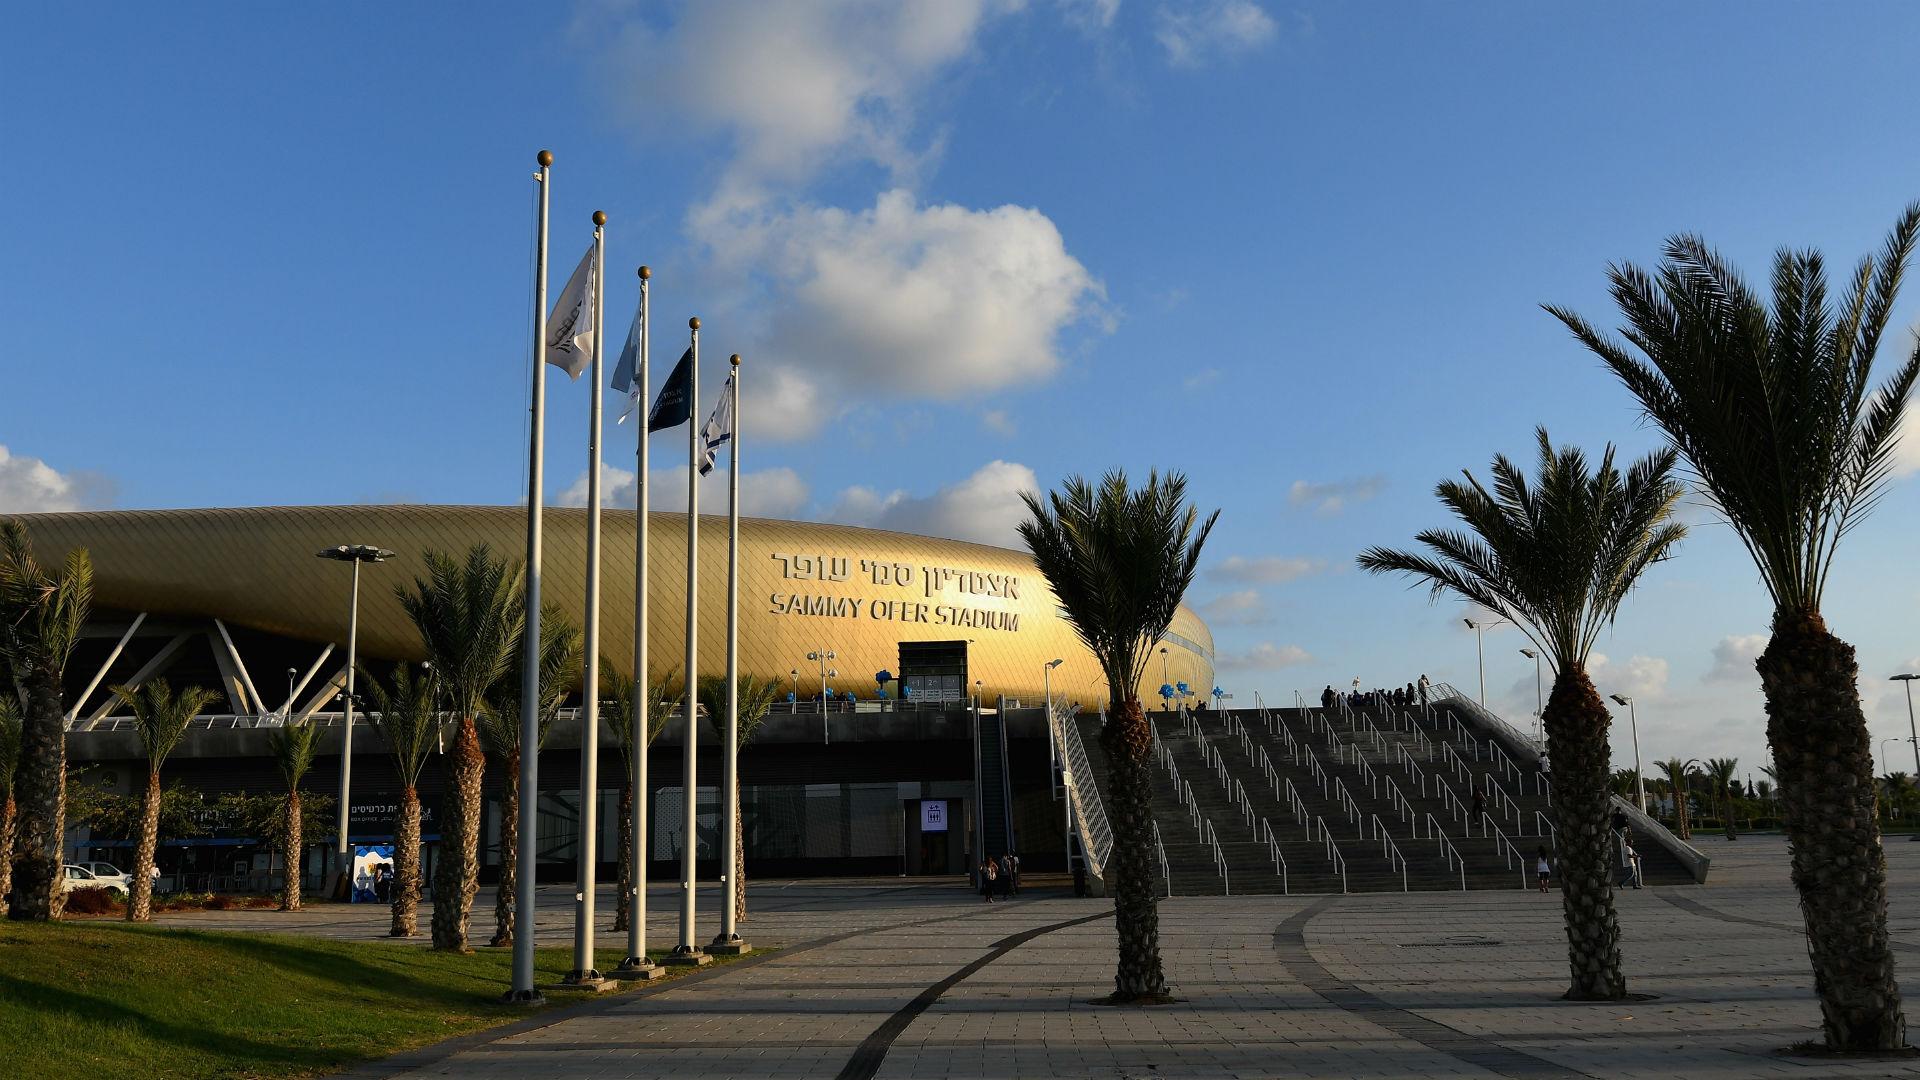 Sammy Ofer Stadium Haifa Israel